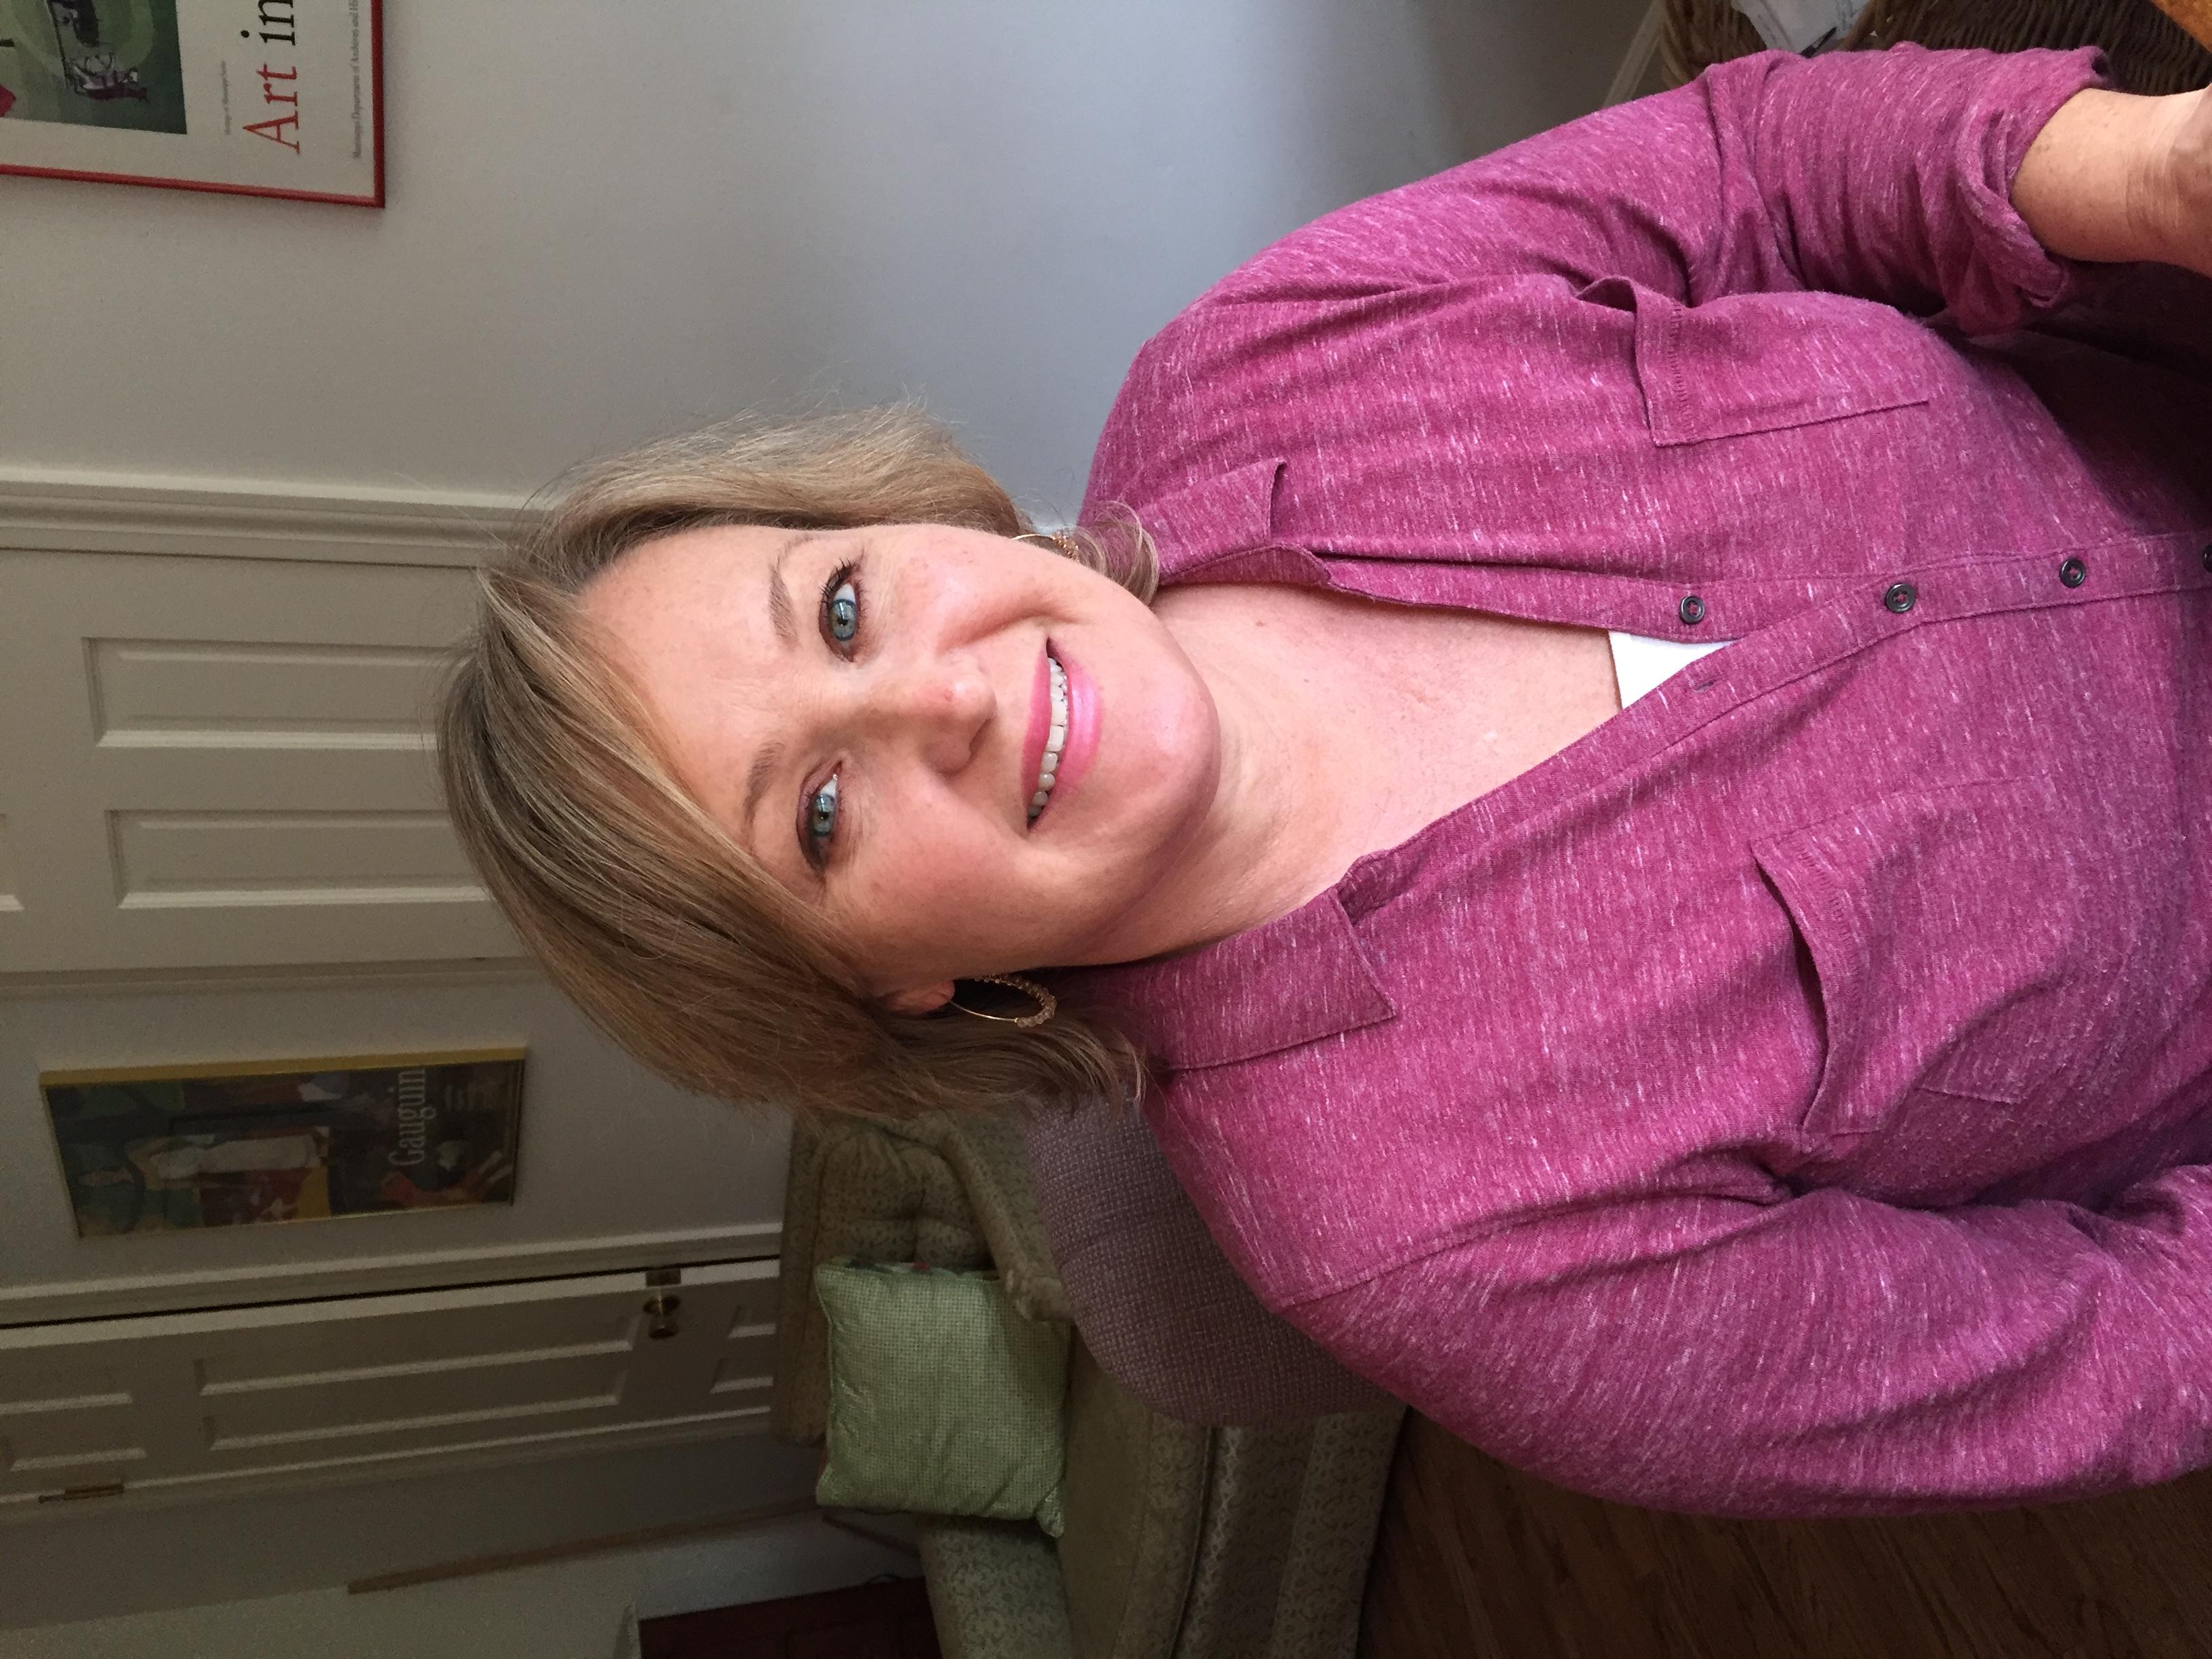 Laura Trew, administrator